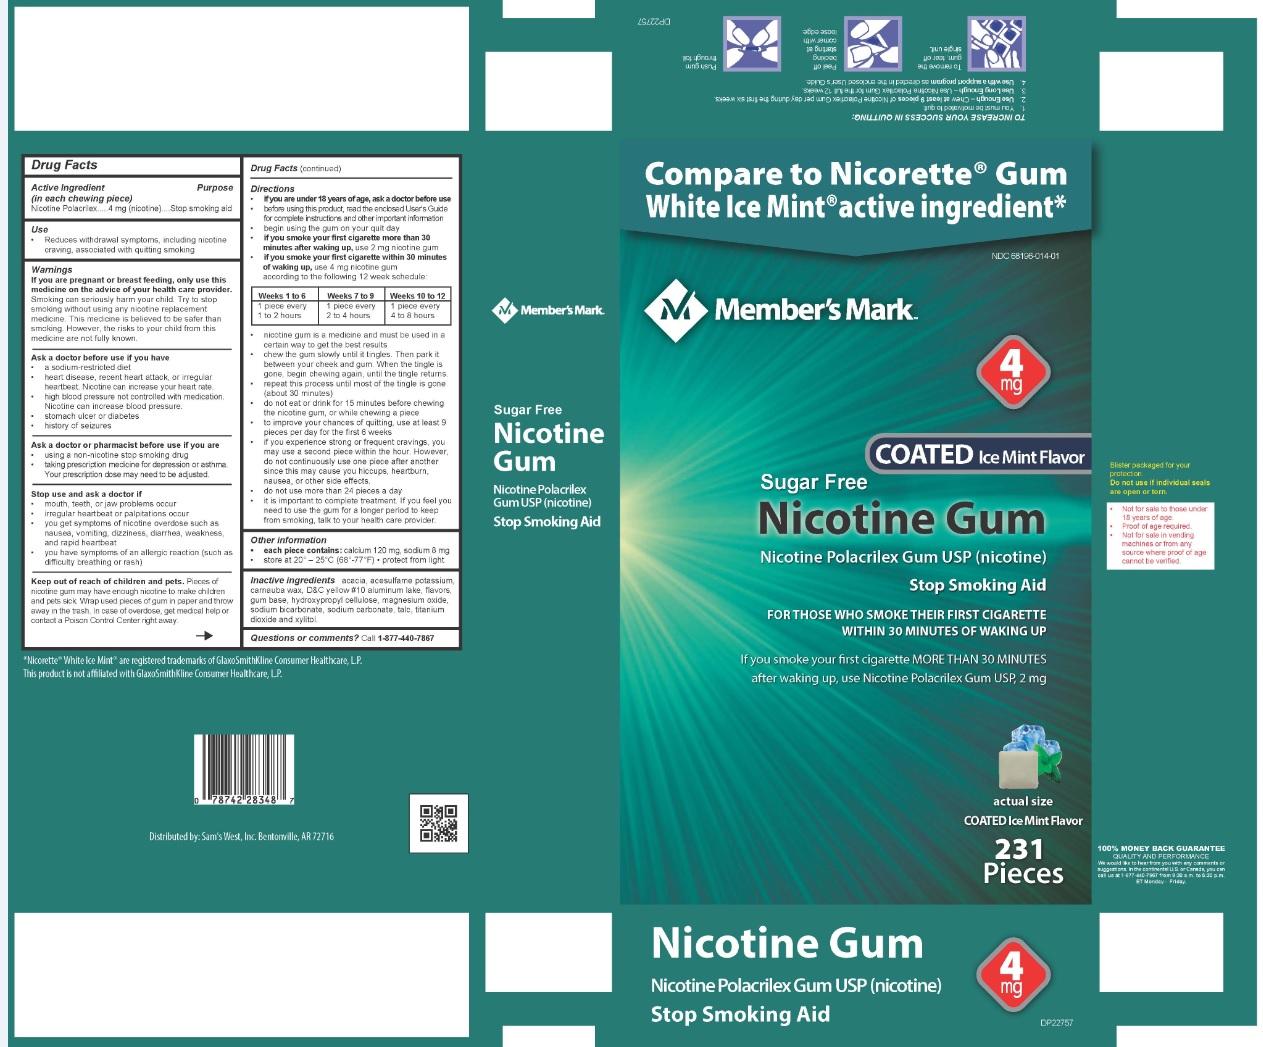 Nicotine Polacrilex Gum USP 4 mg Ice Mint Flavor